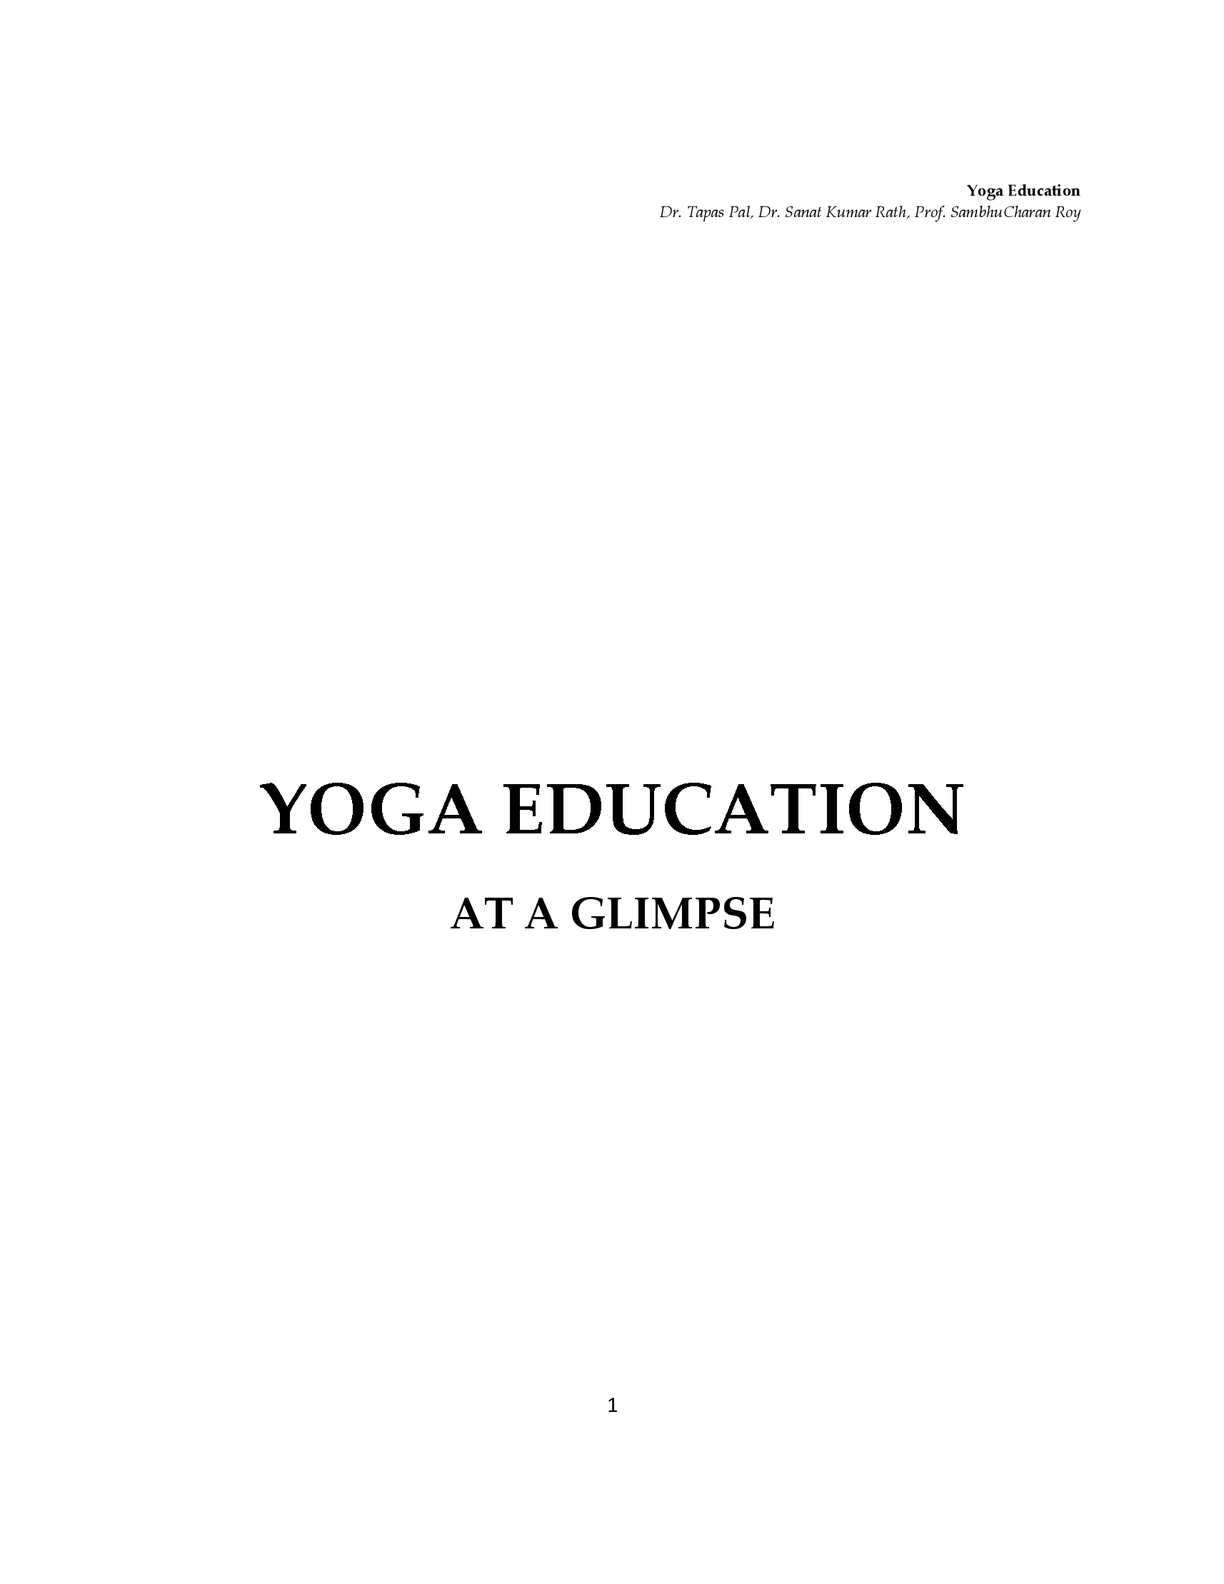 Calaméo - Yoga education, at a glimpse - Tapas Pal, Sanat